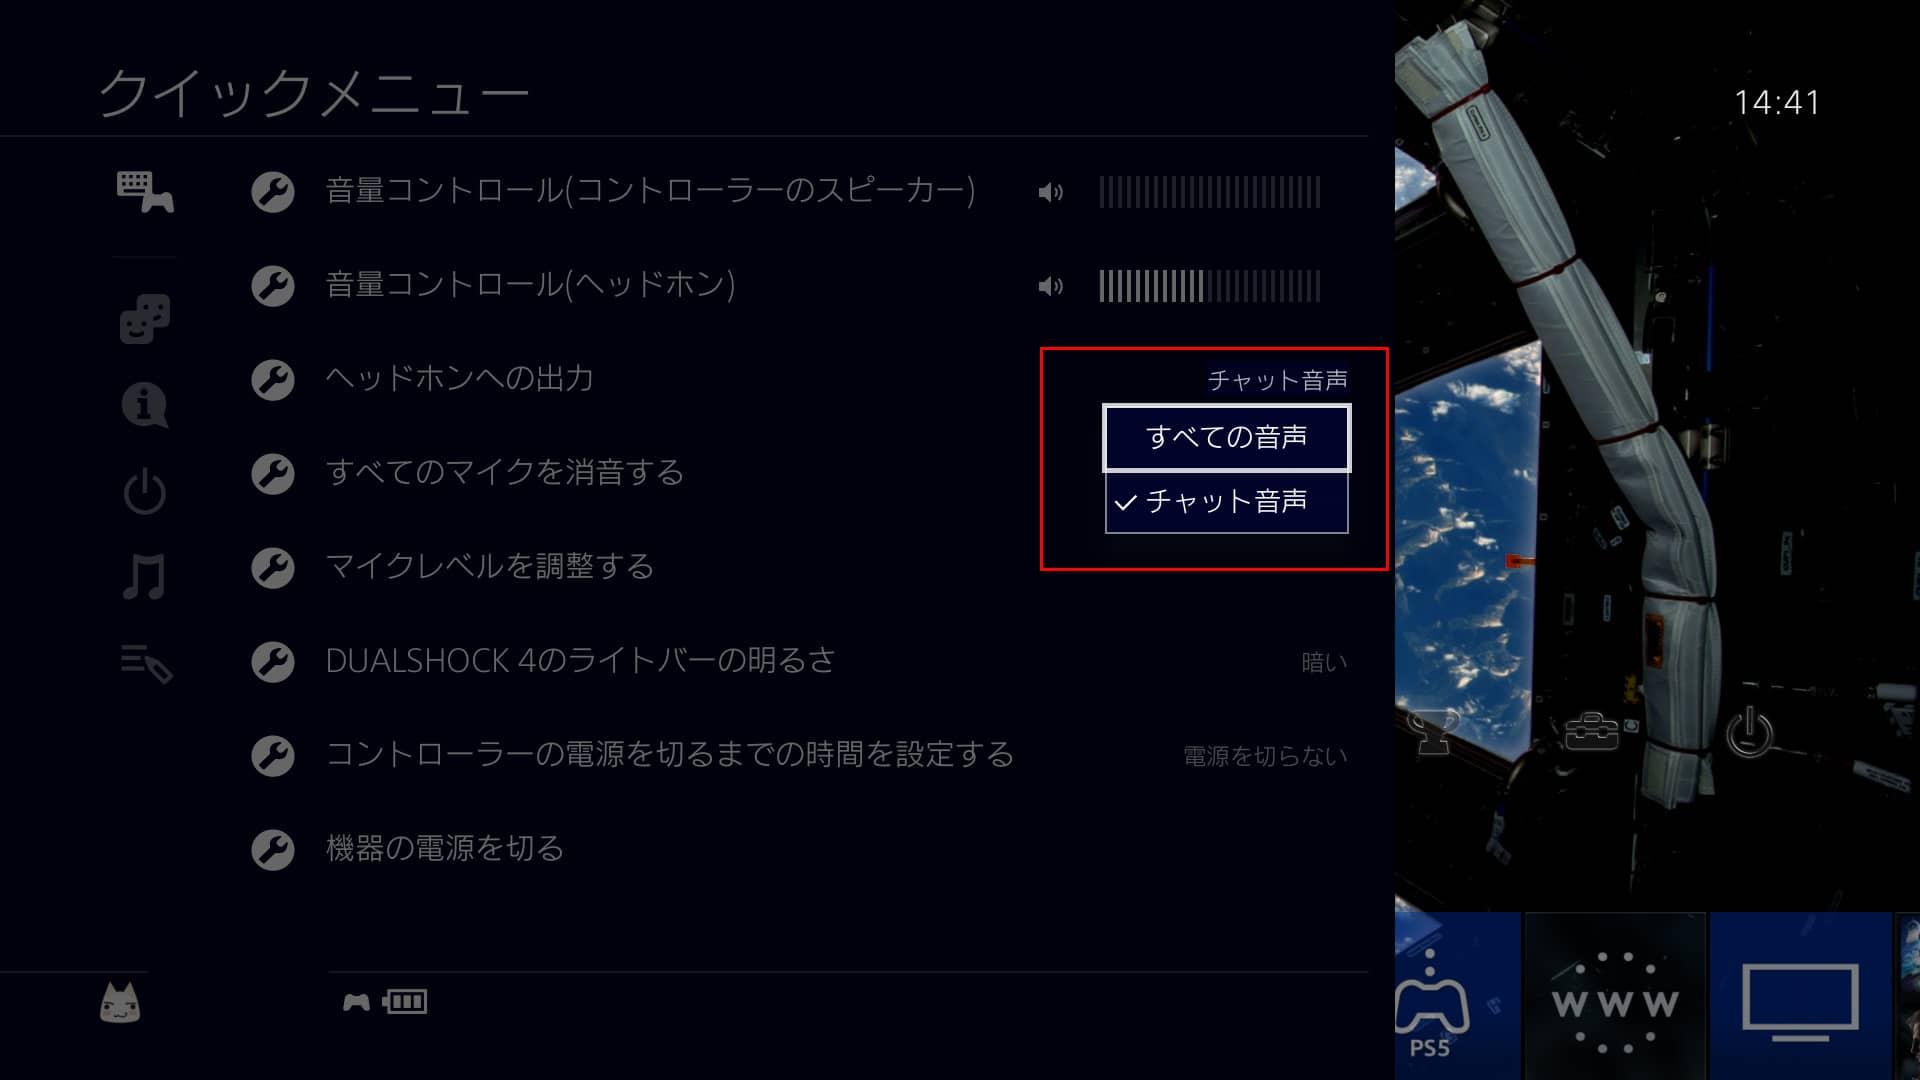 【PS4】AirPodsProで完全コードレス化してウイイレを楽しむ方法